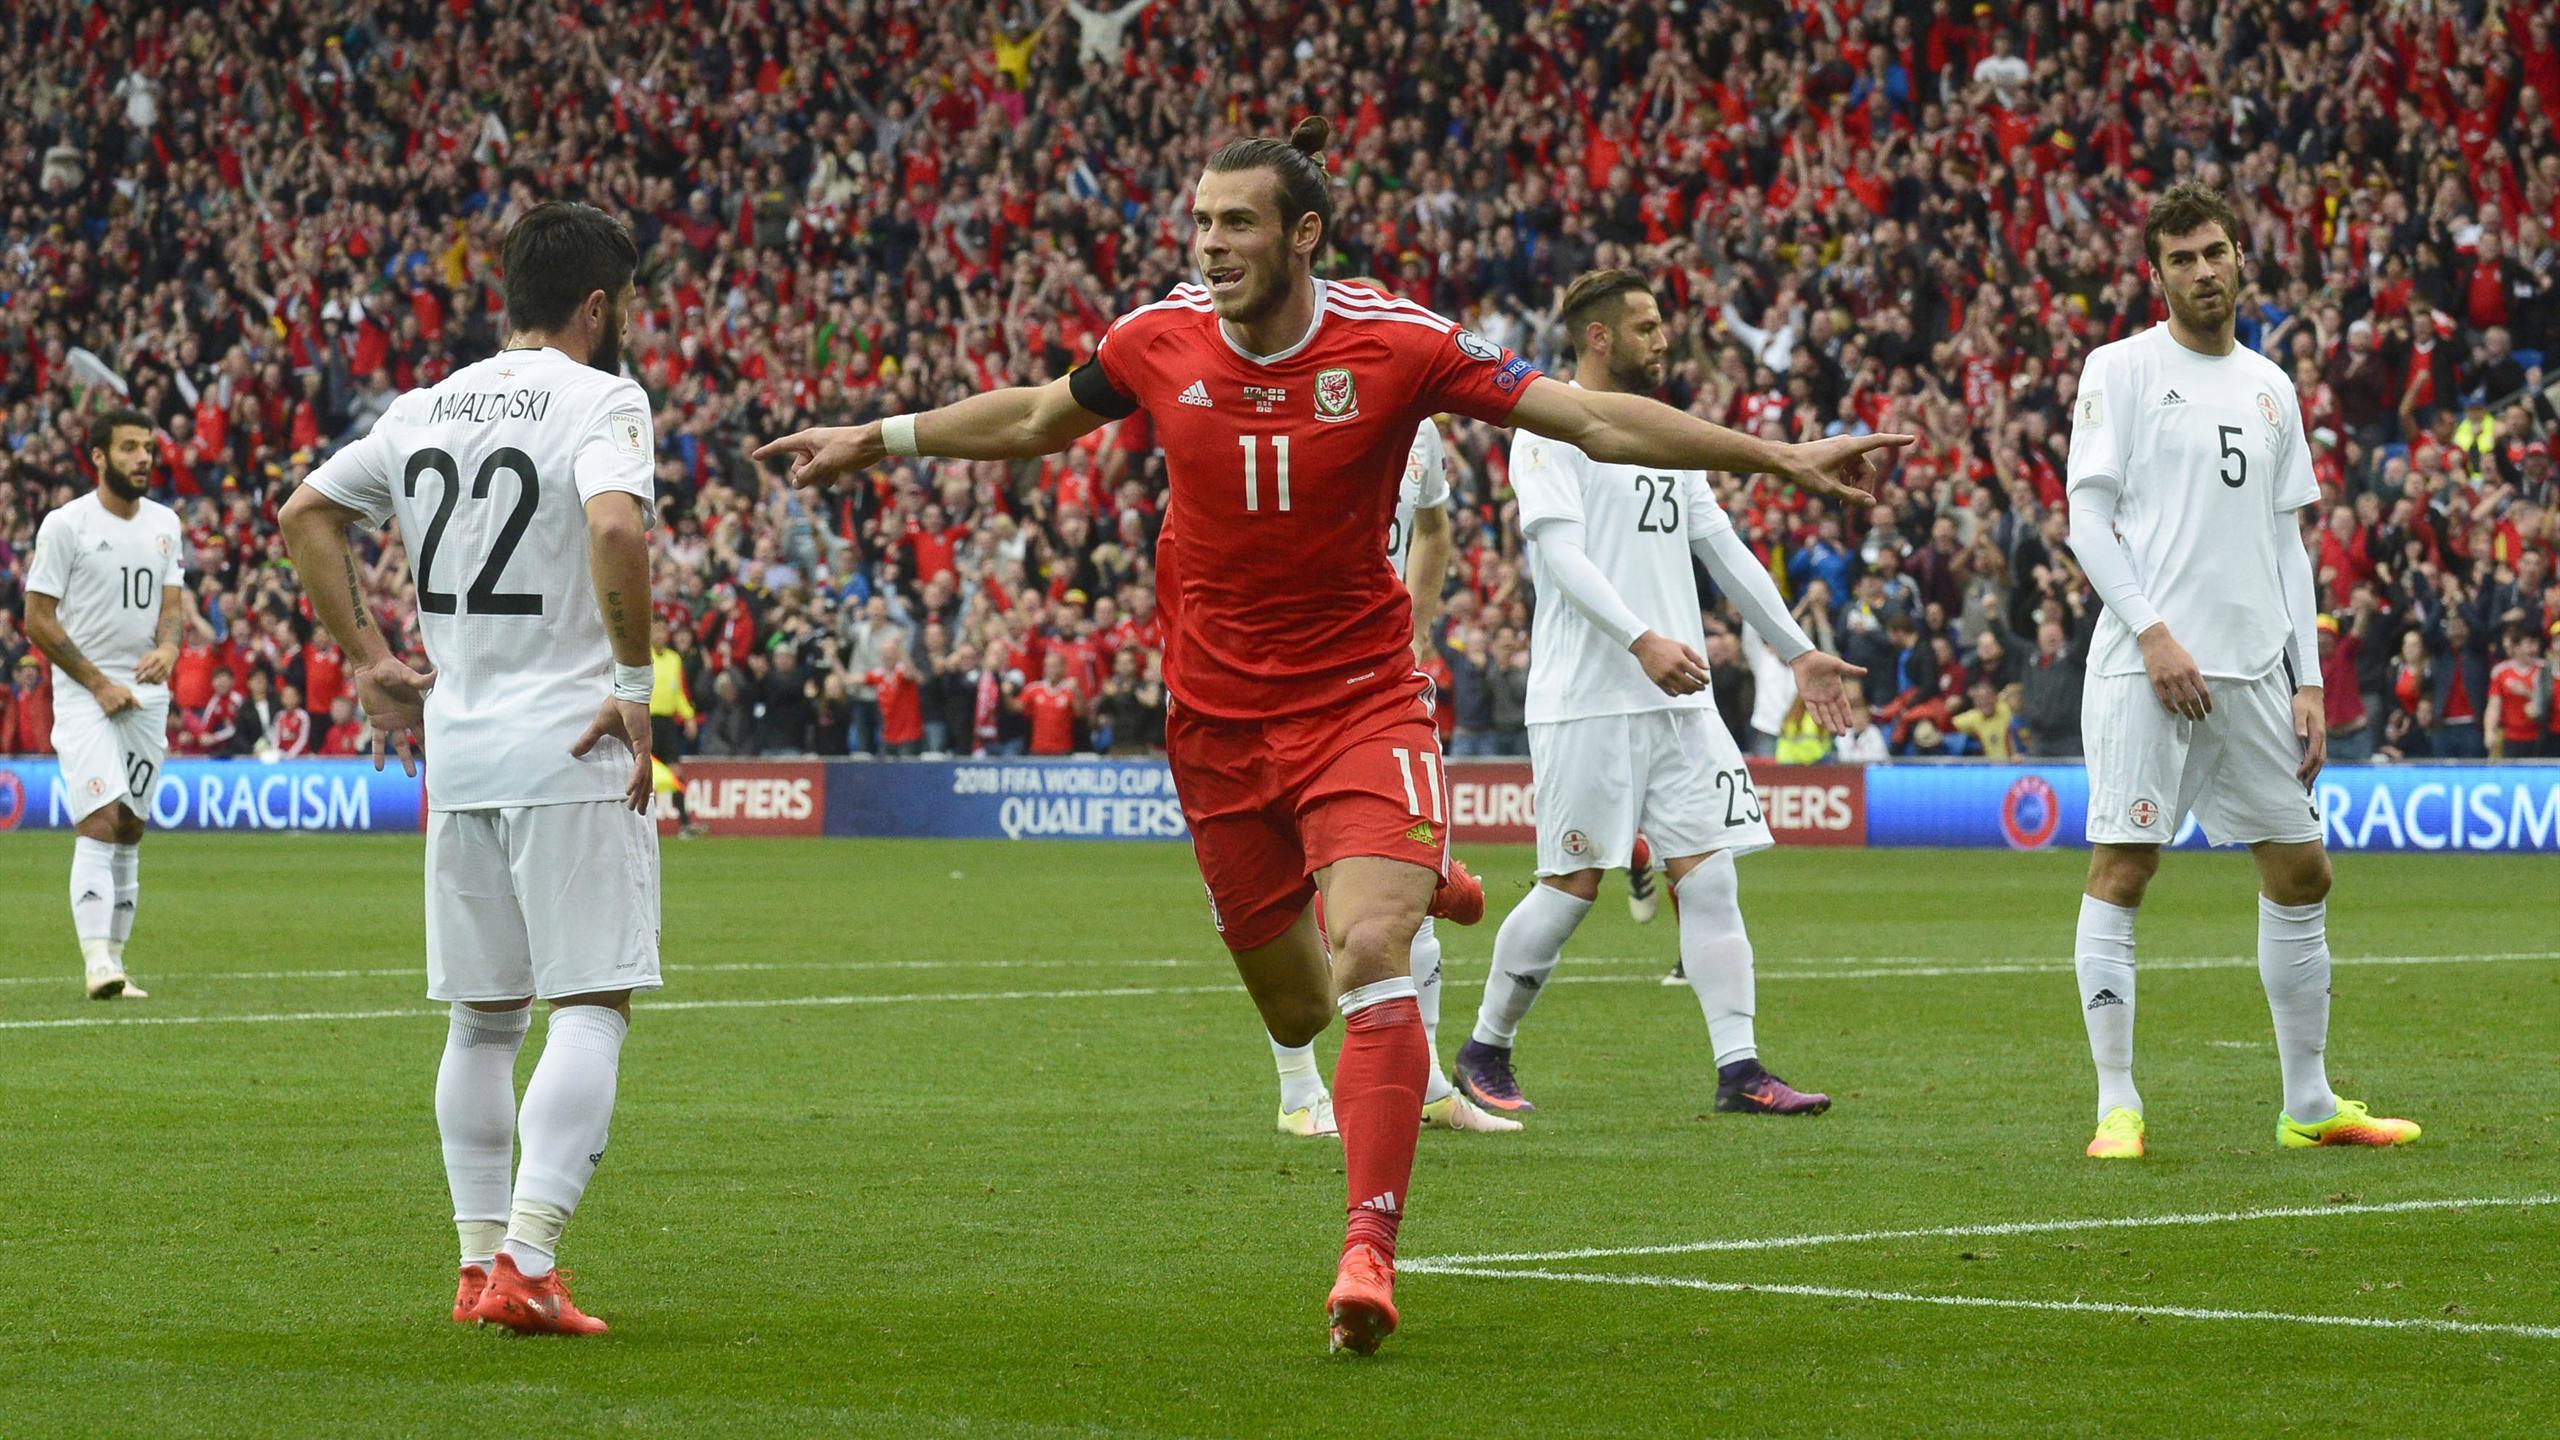 Wales' Gareth Bale celebrates scoring against Georgia